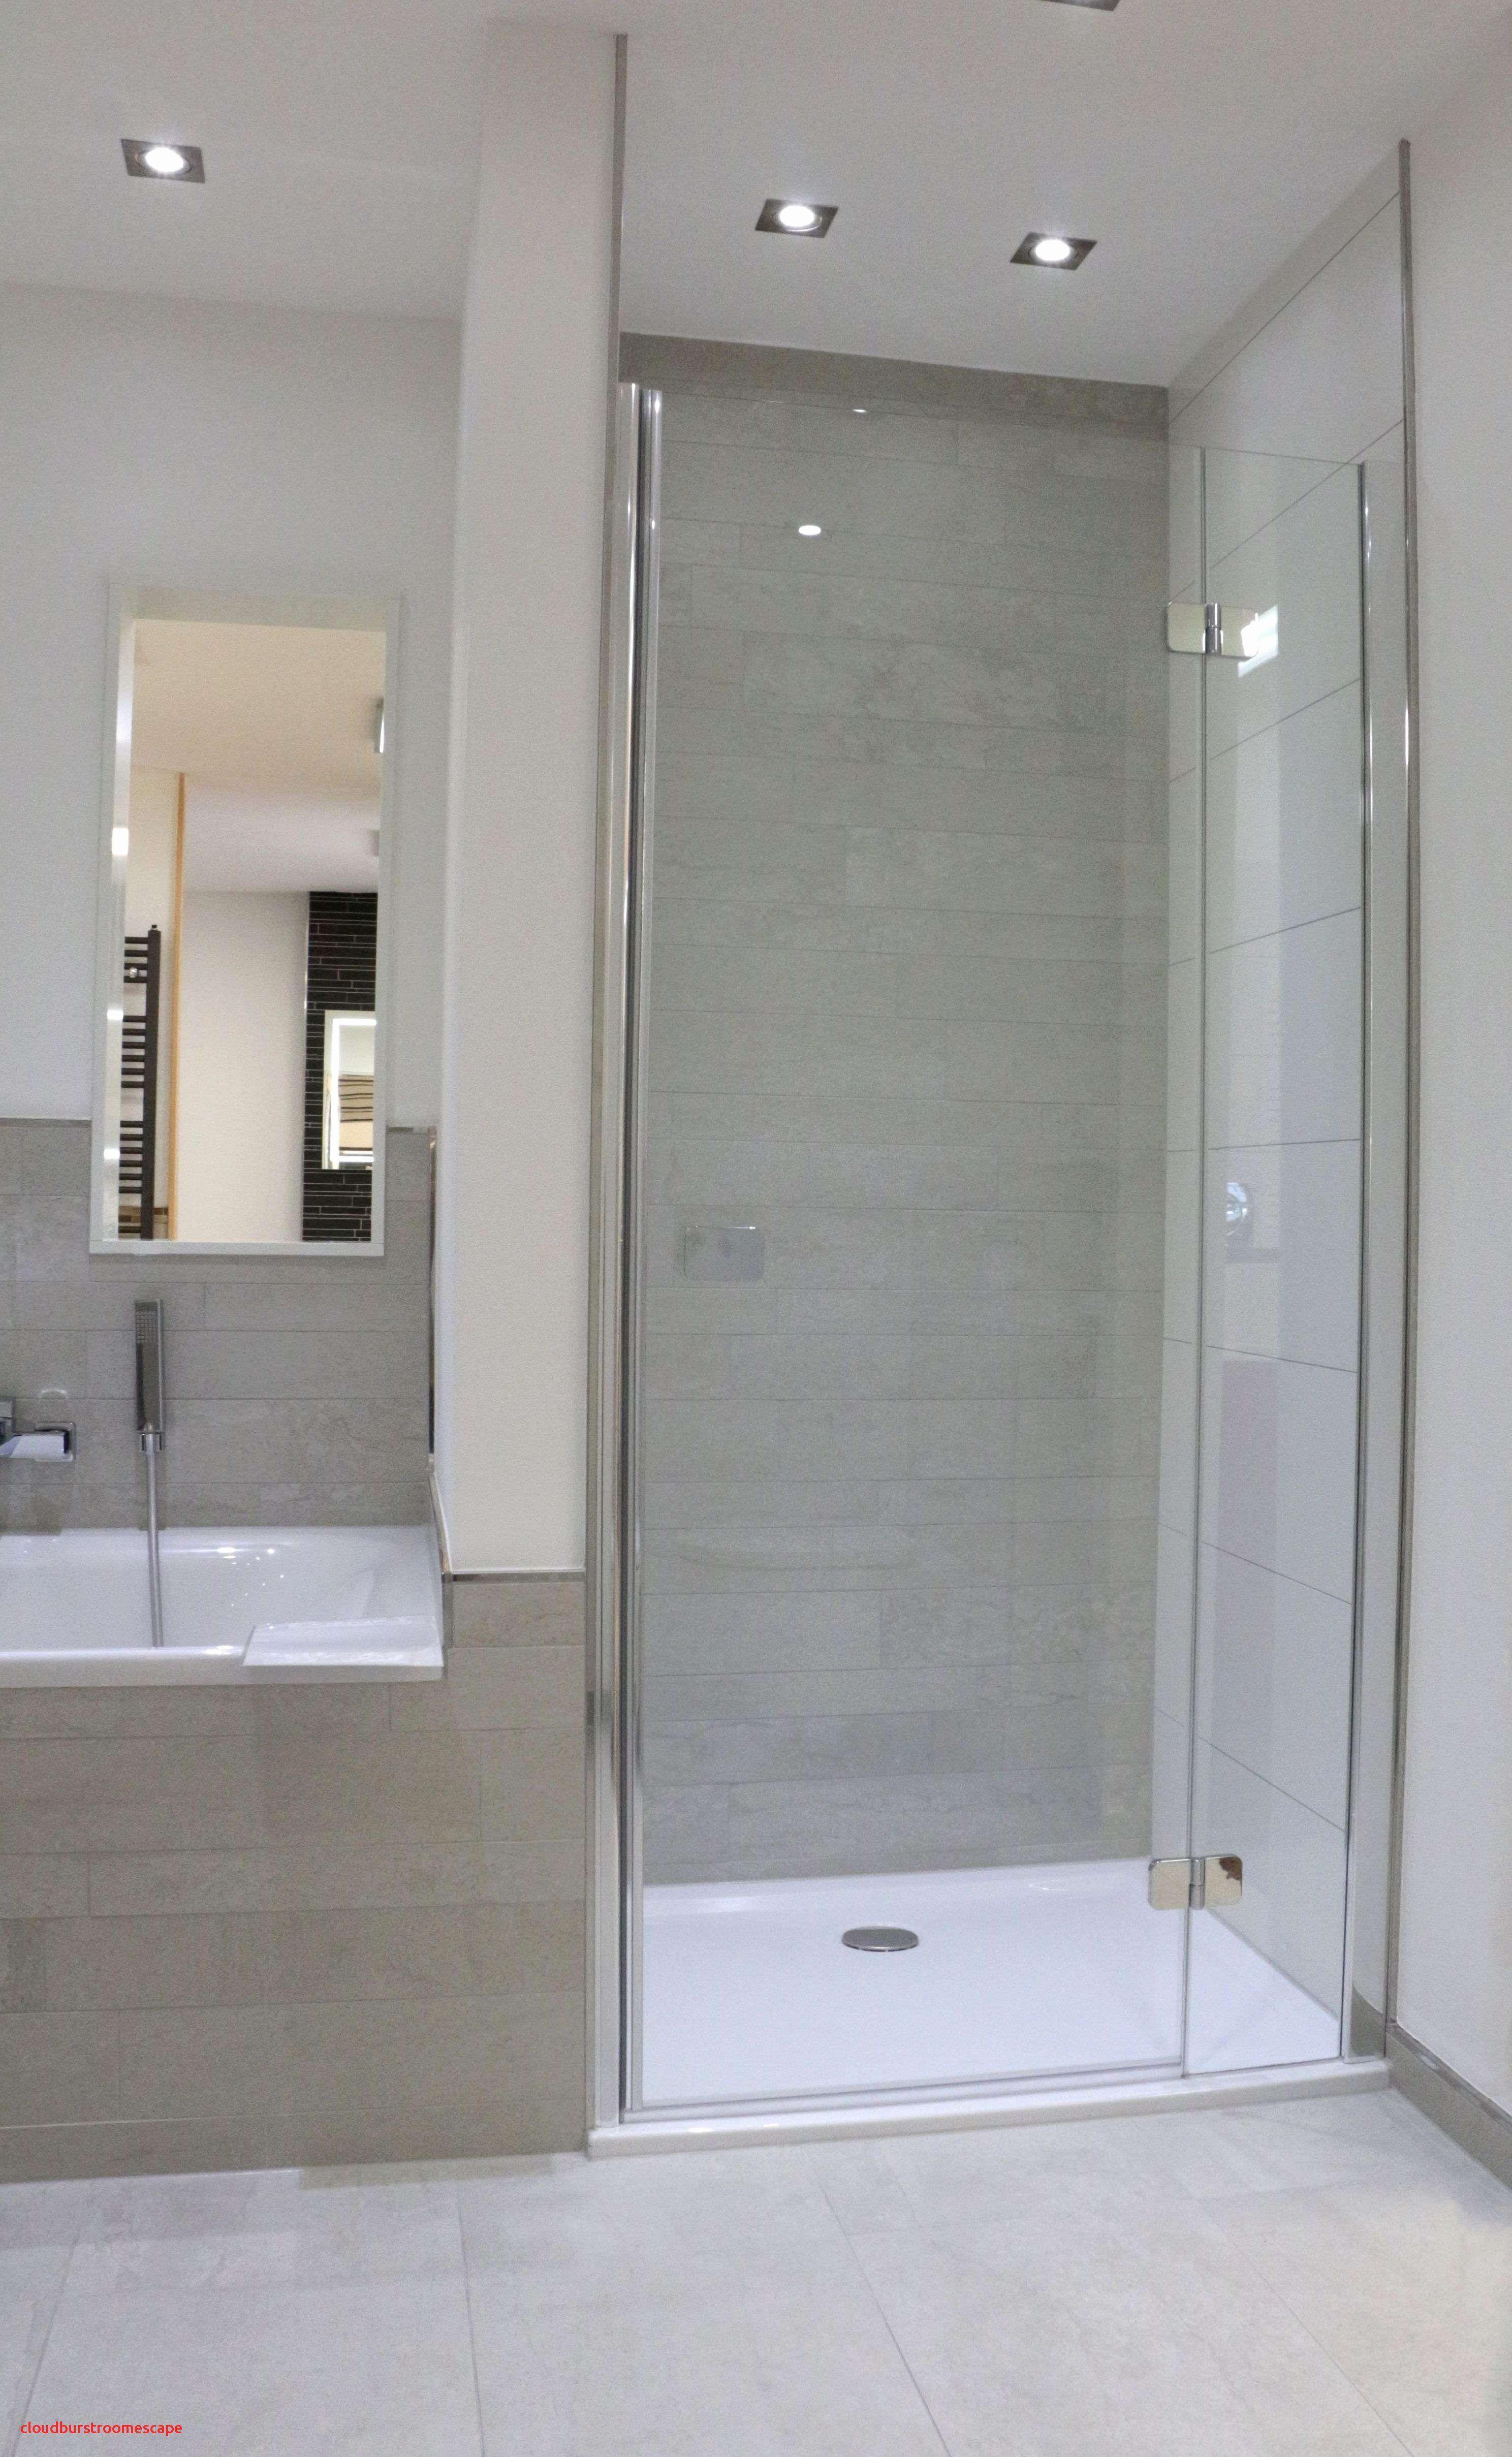 5 Badezimmer Bodenfliesen Badezimmer Fliesen Grau Inspirierend